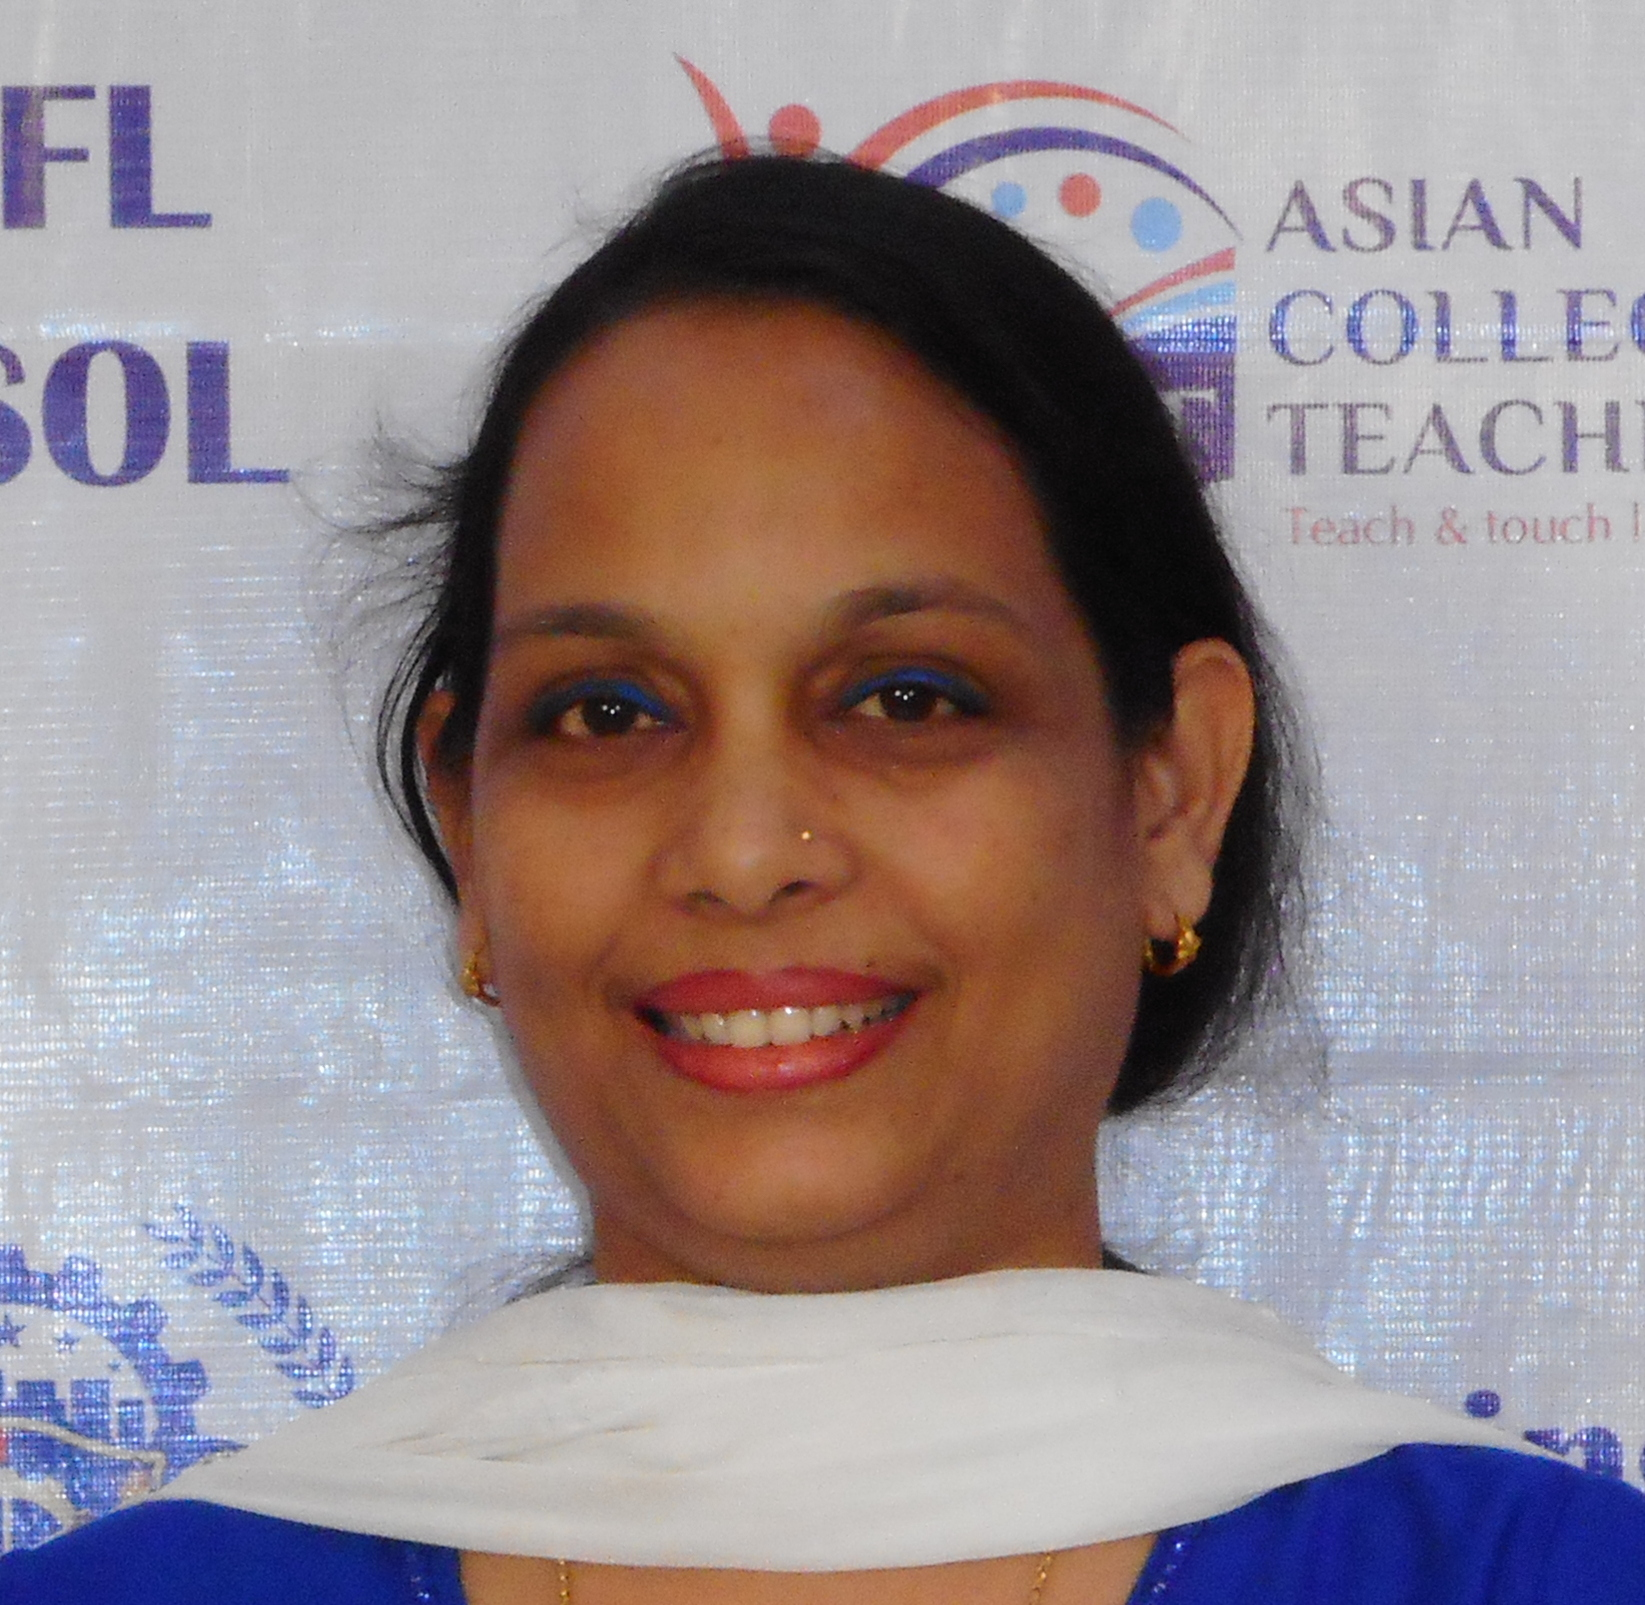 Indira Arukh